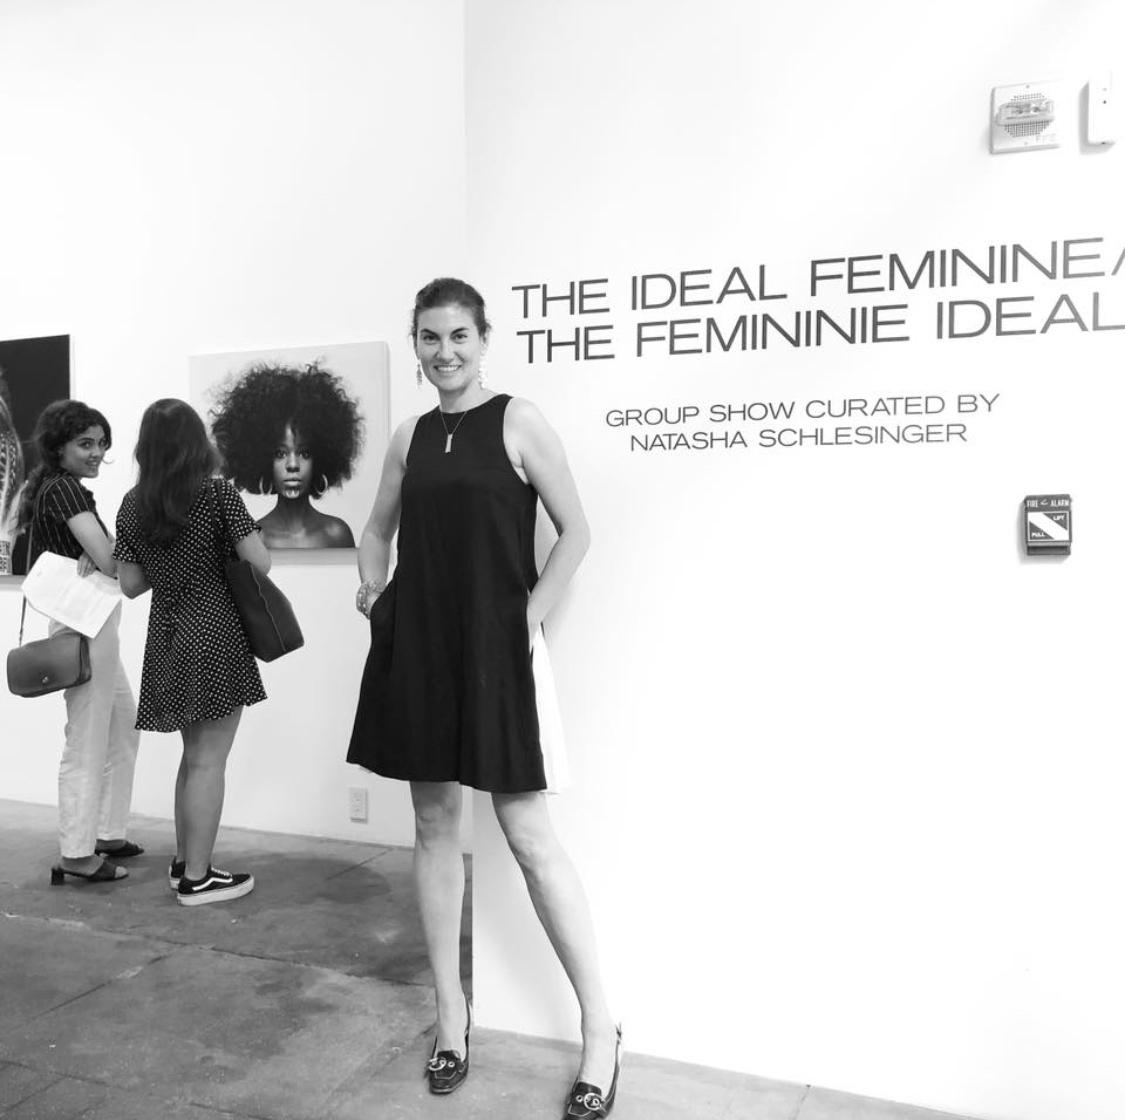 Natasha at the opening of     The Ideal Feminine, The Feminine Ideal?     at    Winston Wachter Fine Art     photo credit    Tanya Malott